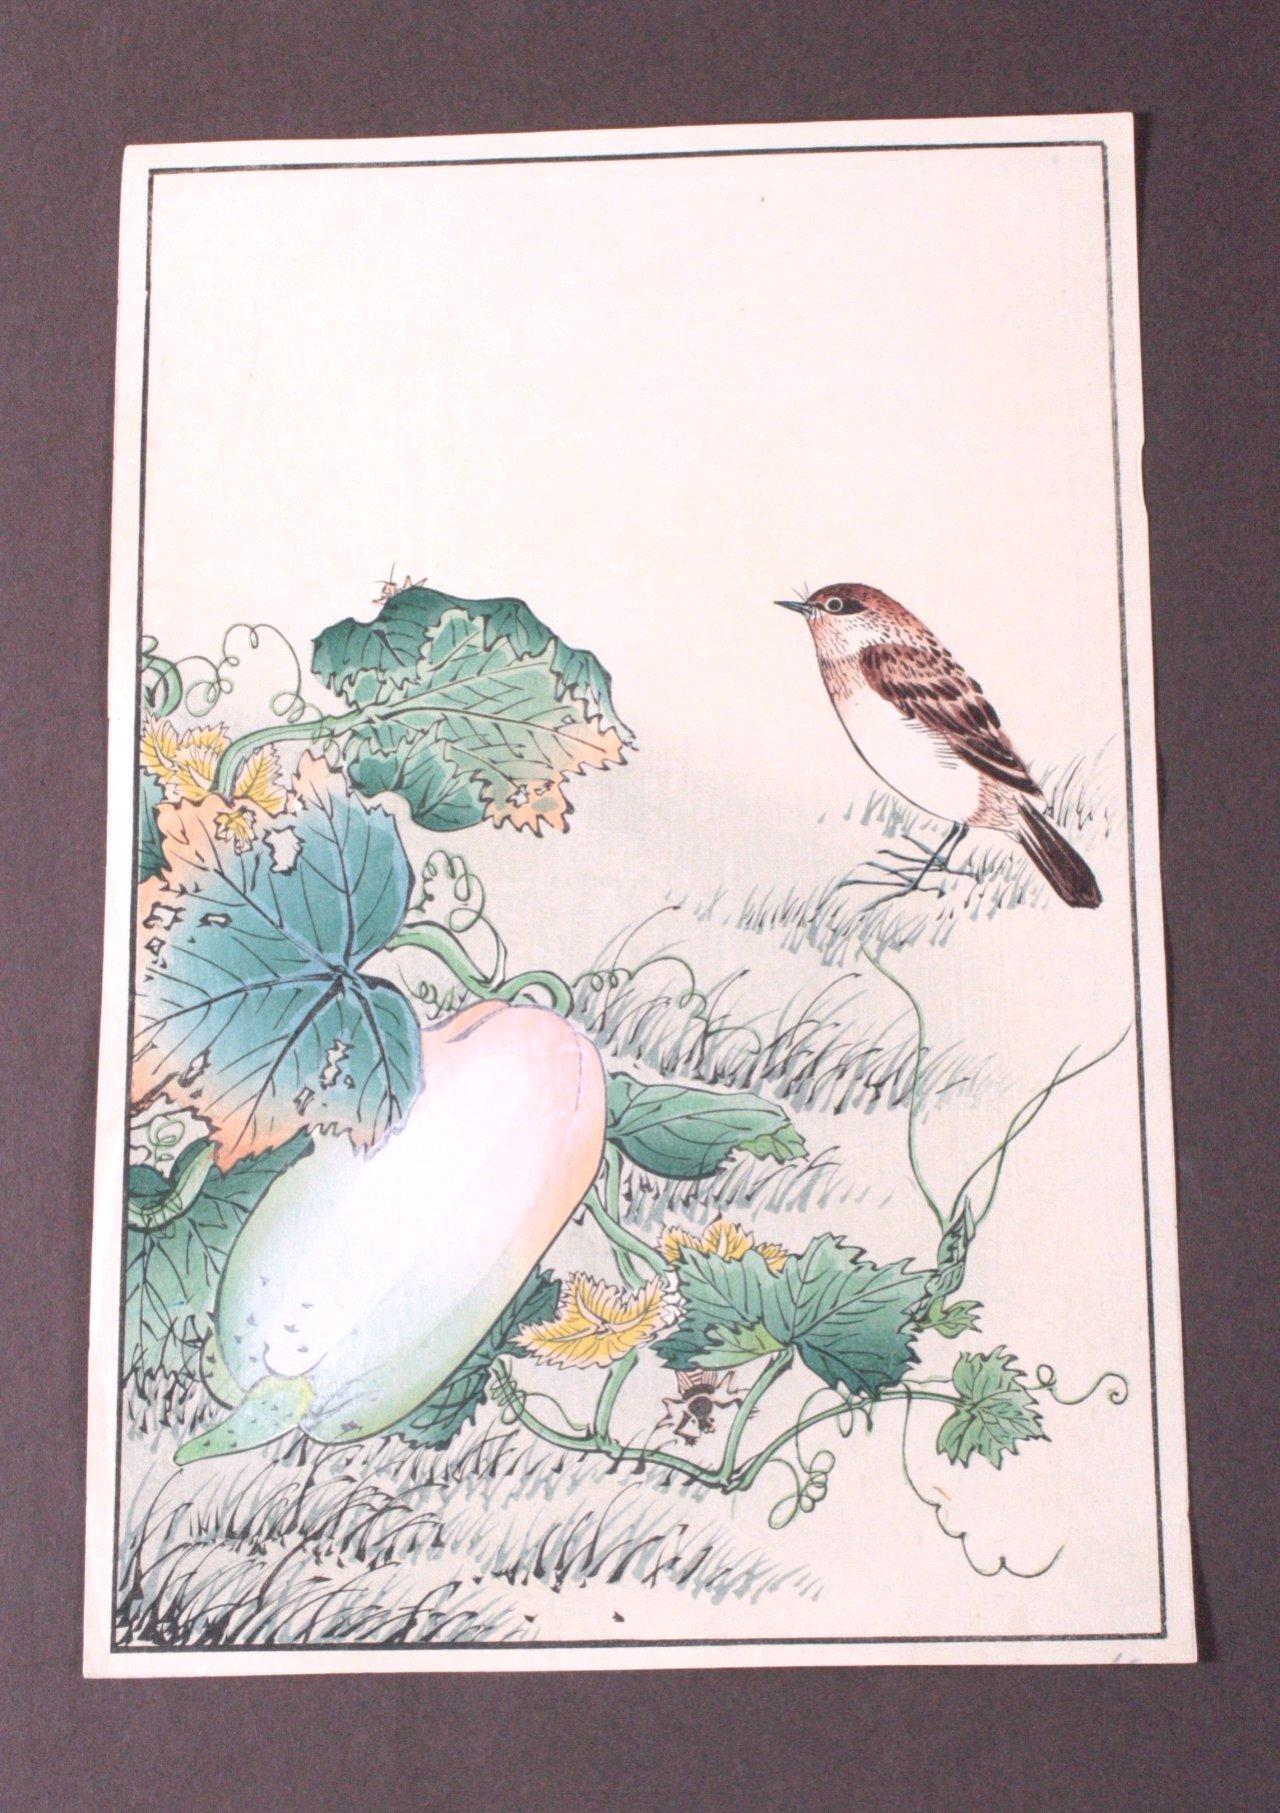 Nakayama Sugahudo ?-?, Vogel mit Kürbis